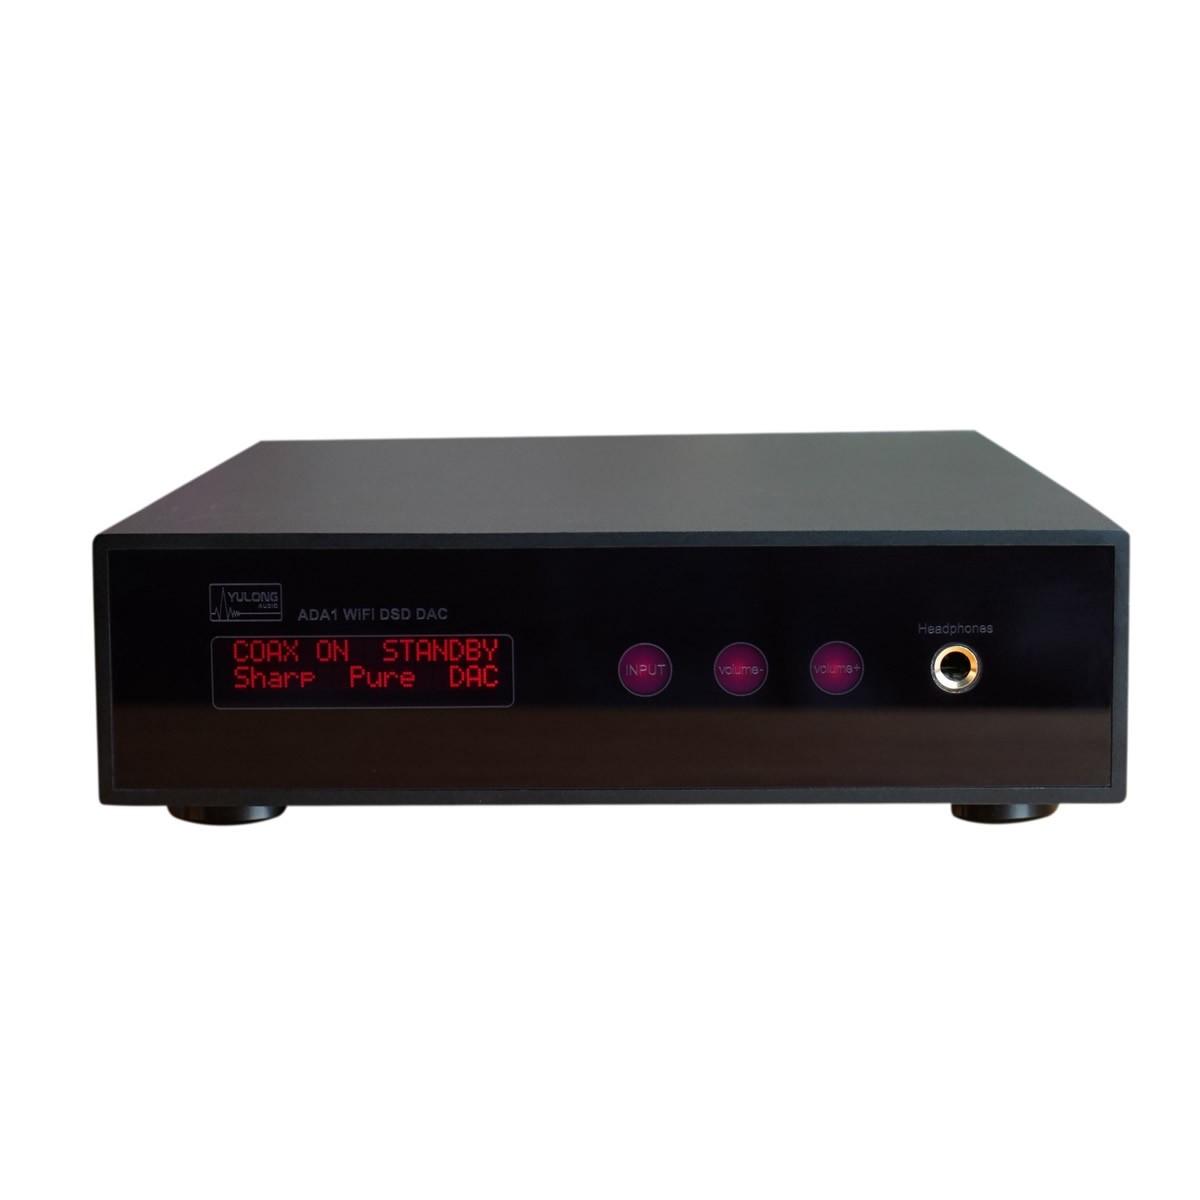 YULONG AUDIO ADA1 DAC USB Airplay DLNA ampli casque DSD 32bit 384Khz Noir